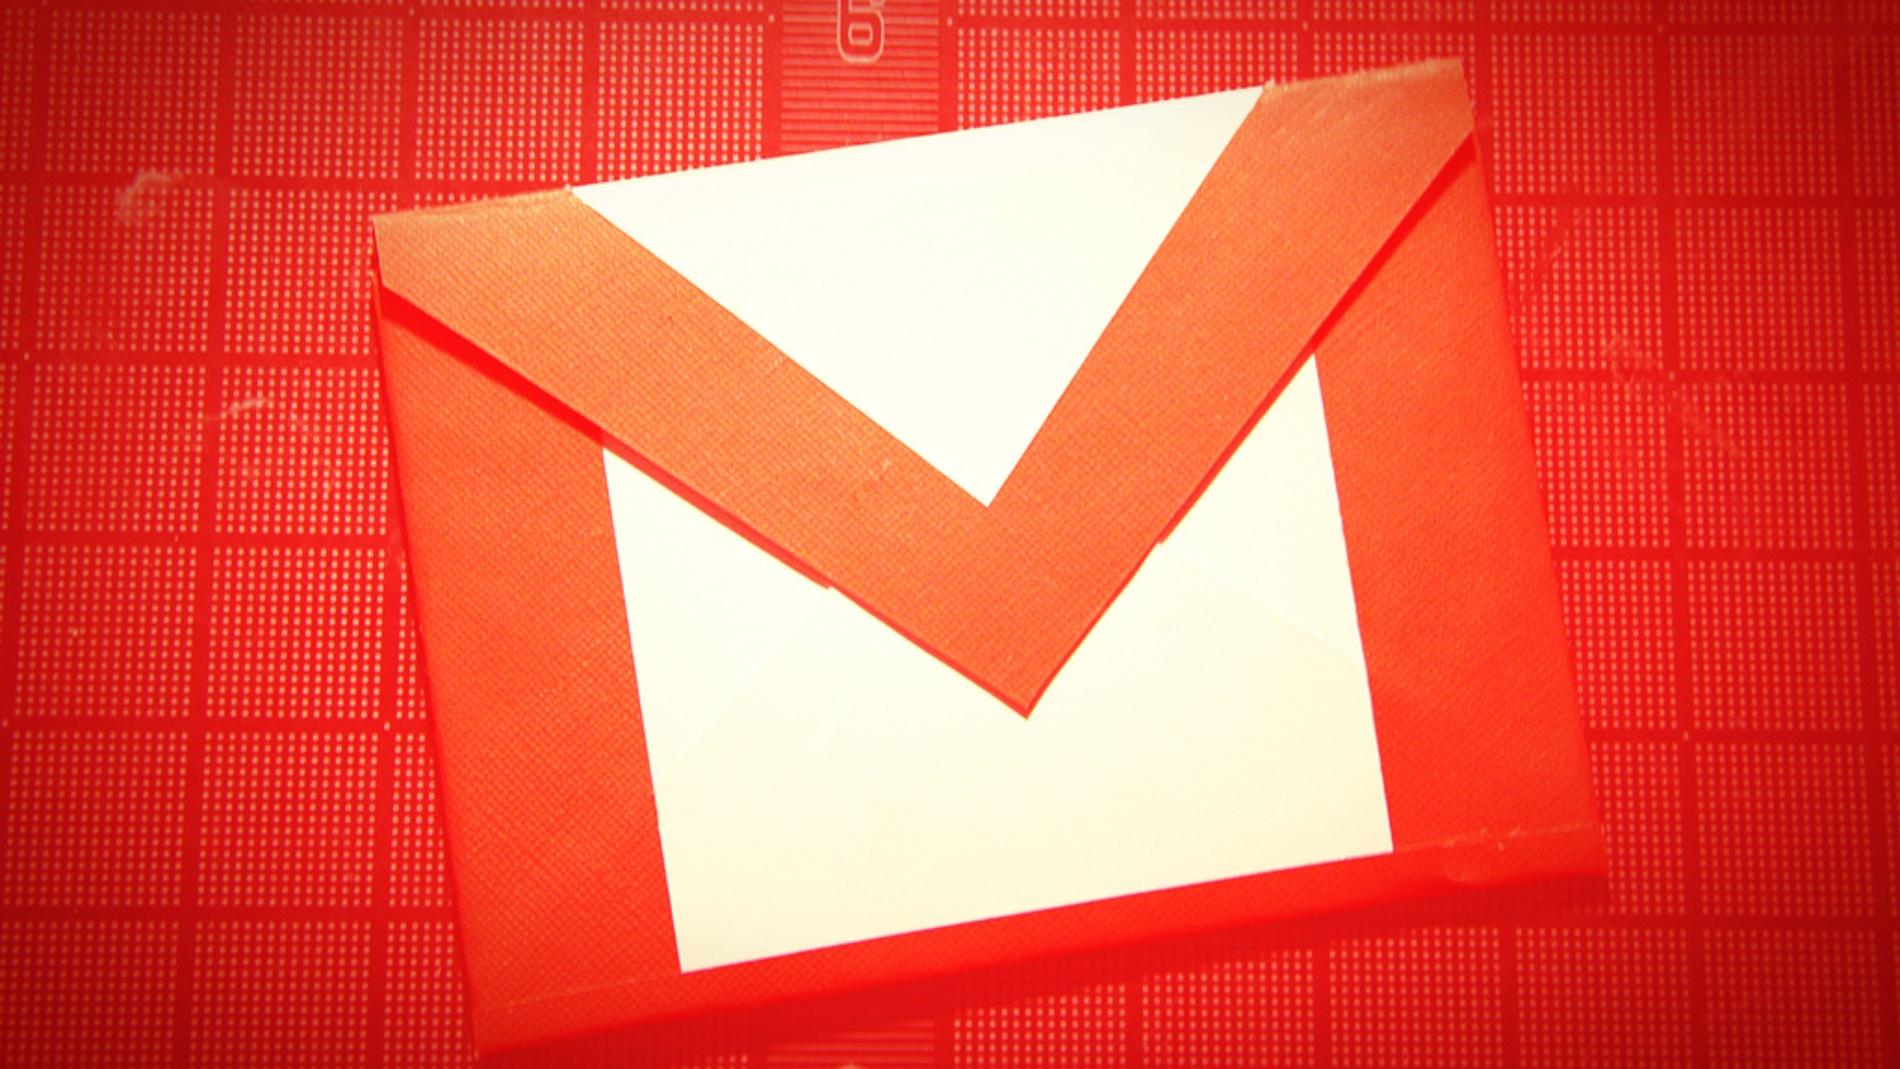 Logotipo de Gmail